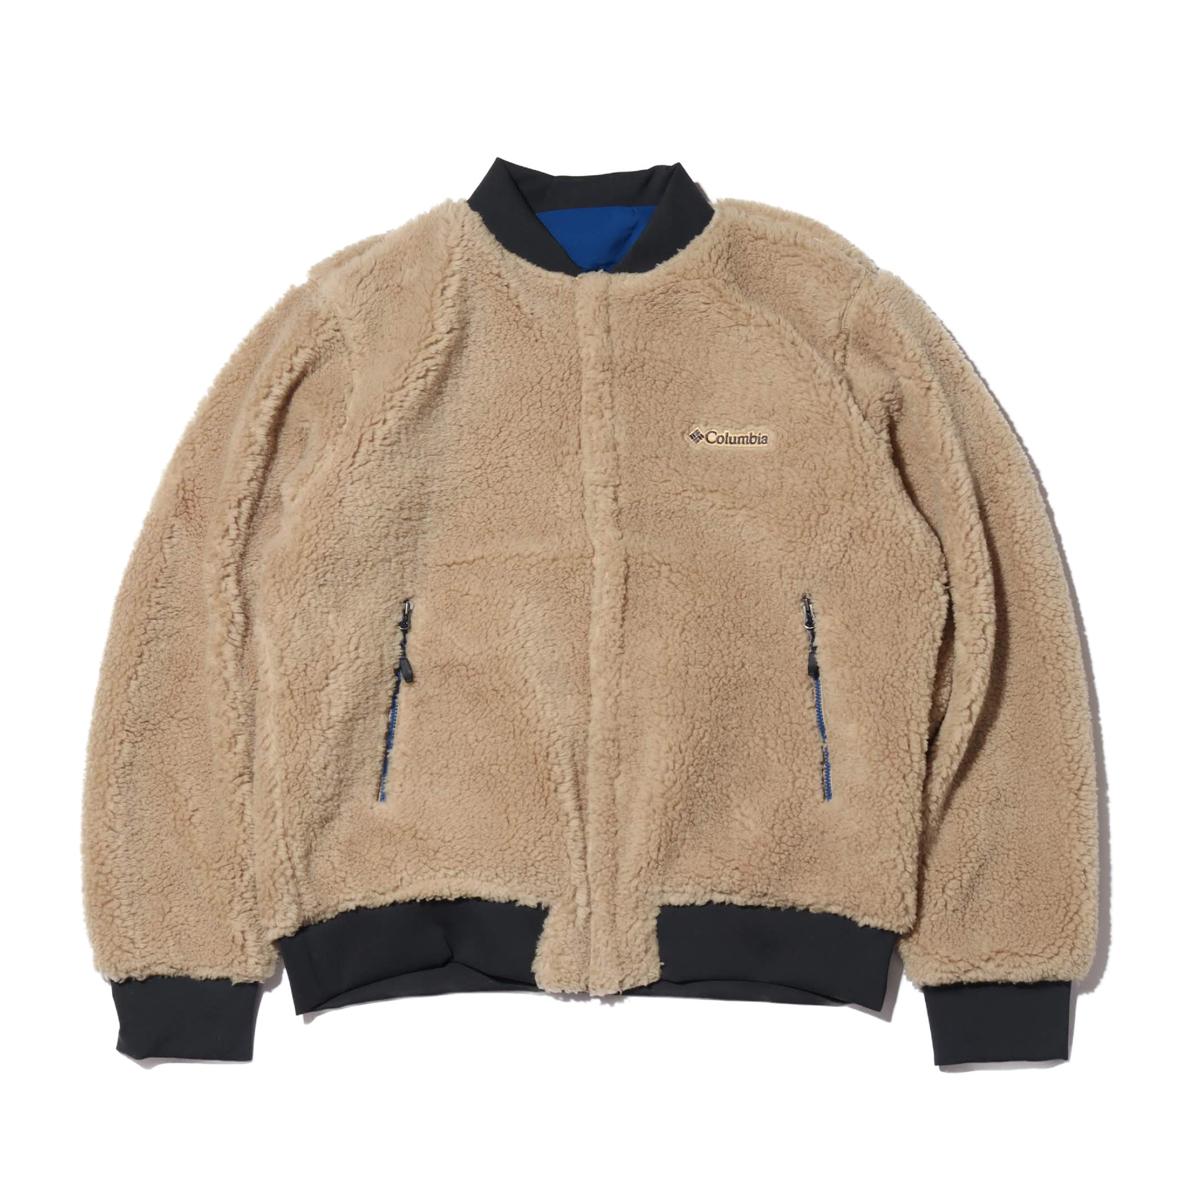 Columbia Slaughter Slope™ Jacket(British Tan)(コロンビア スロータースロープ ジャケット)【メンズ】【ジャケット】【19FA-I】